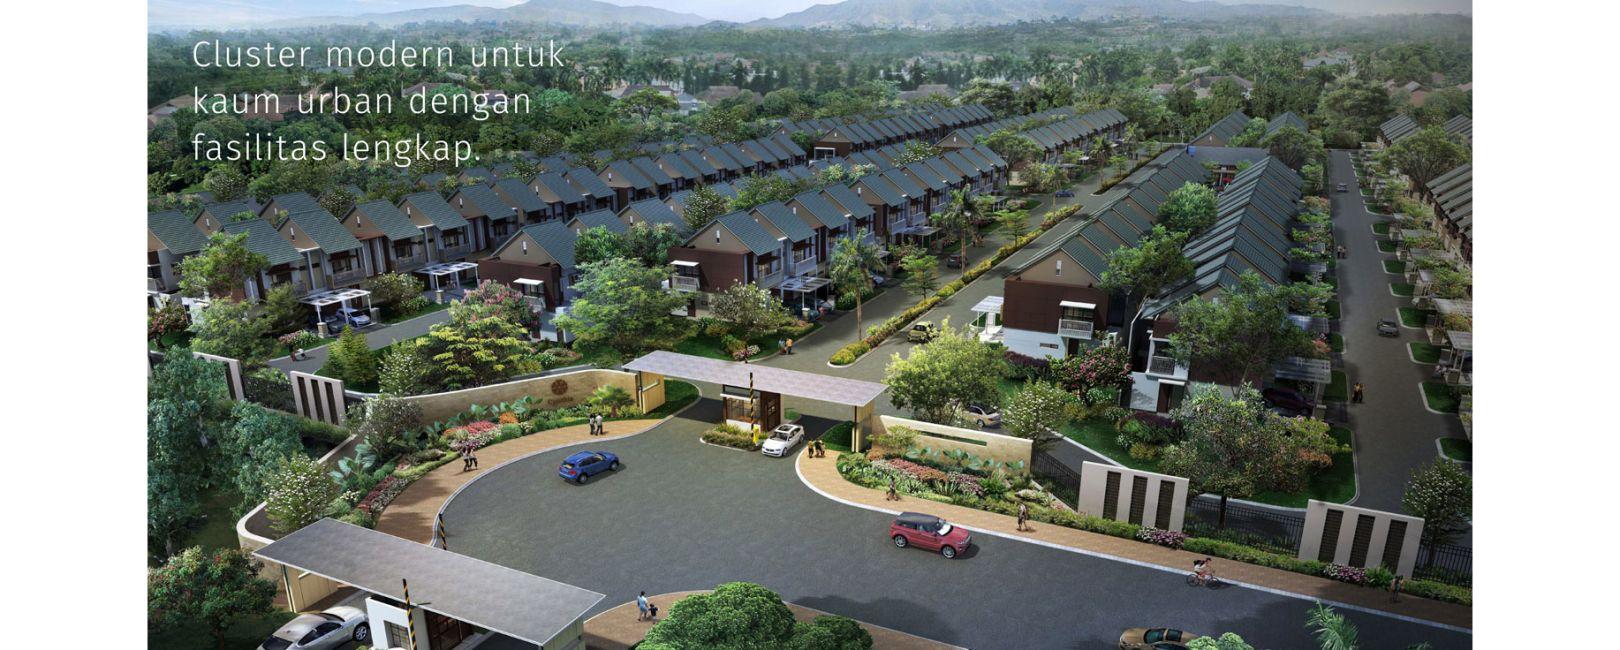 Residensial Cluster Cynthia at Summarecon Bandung di Bandung